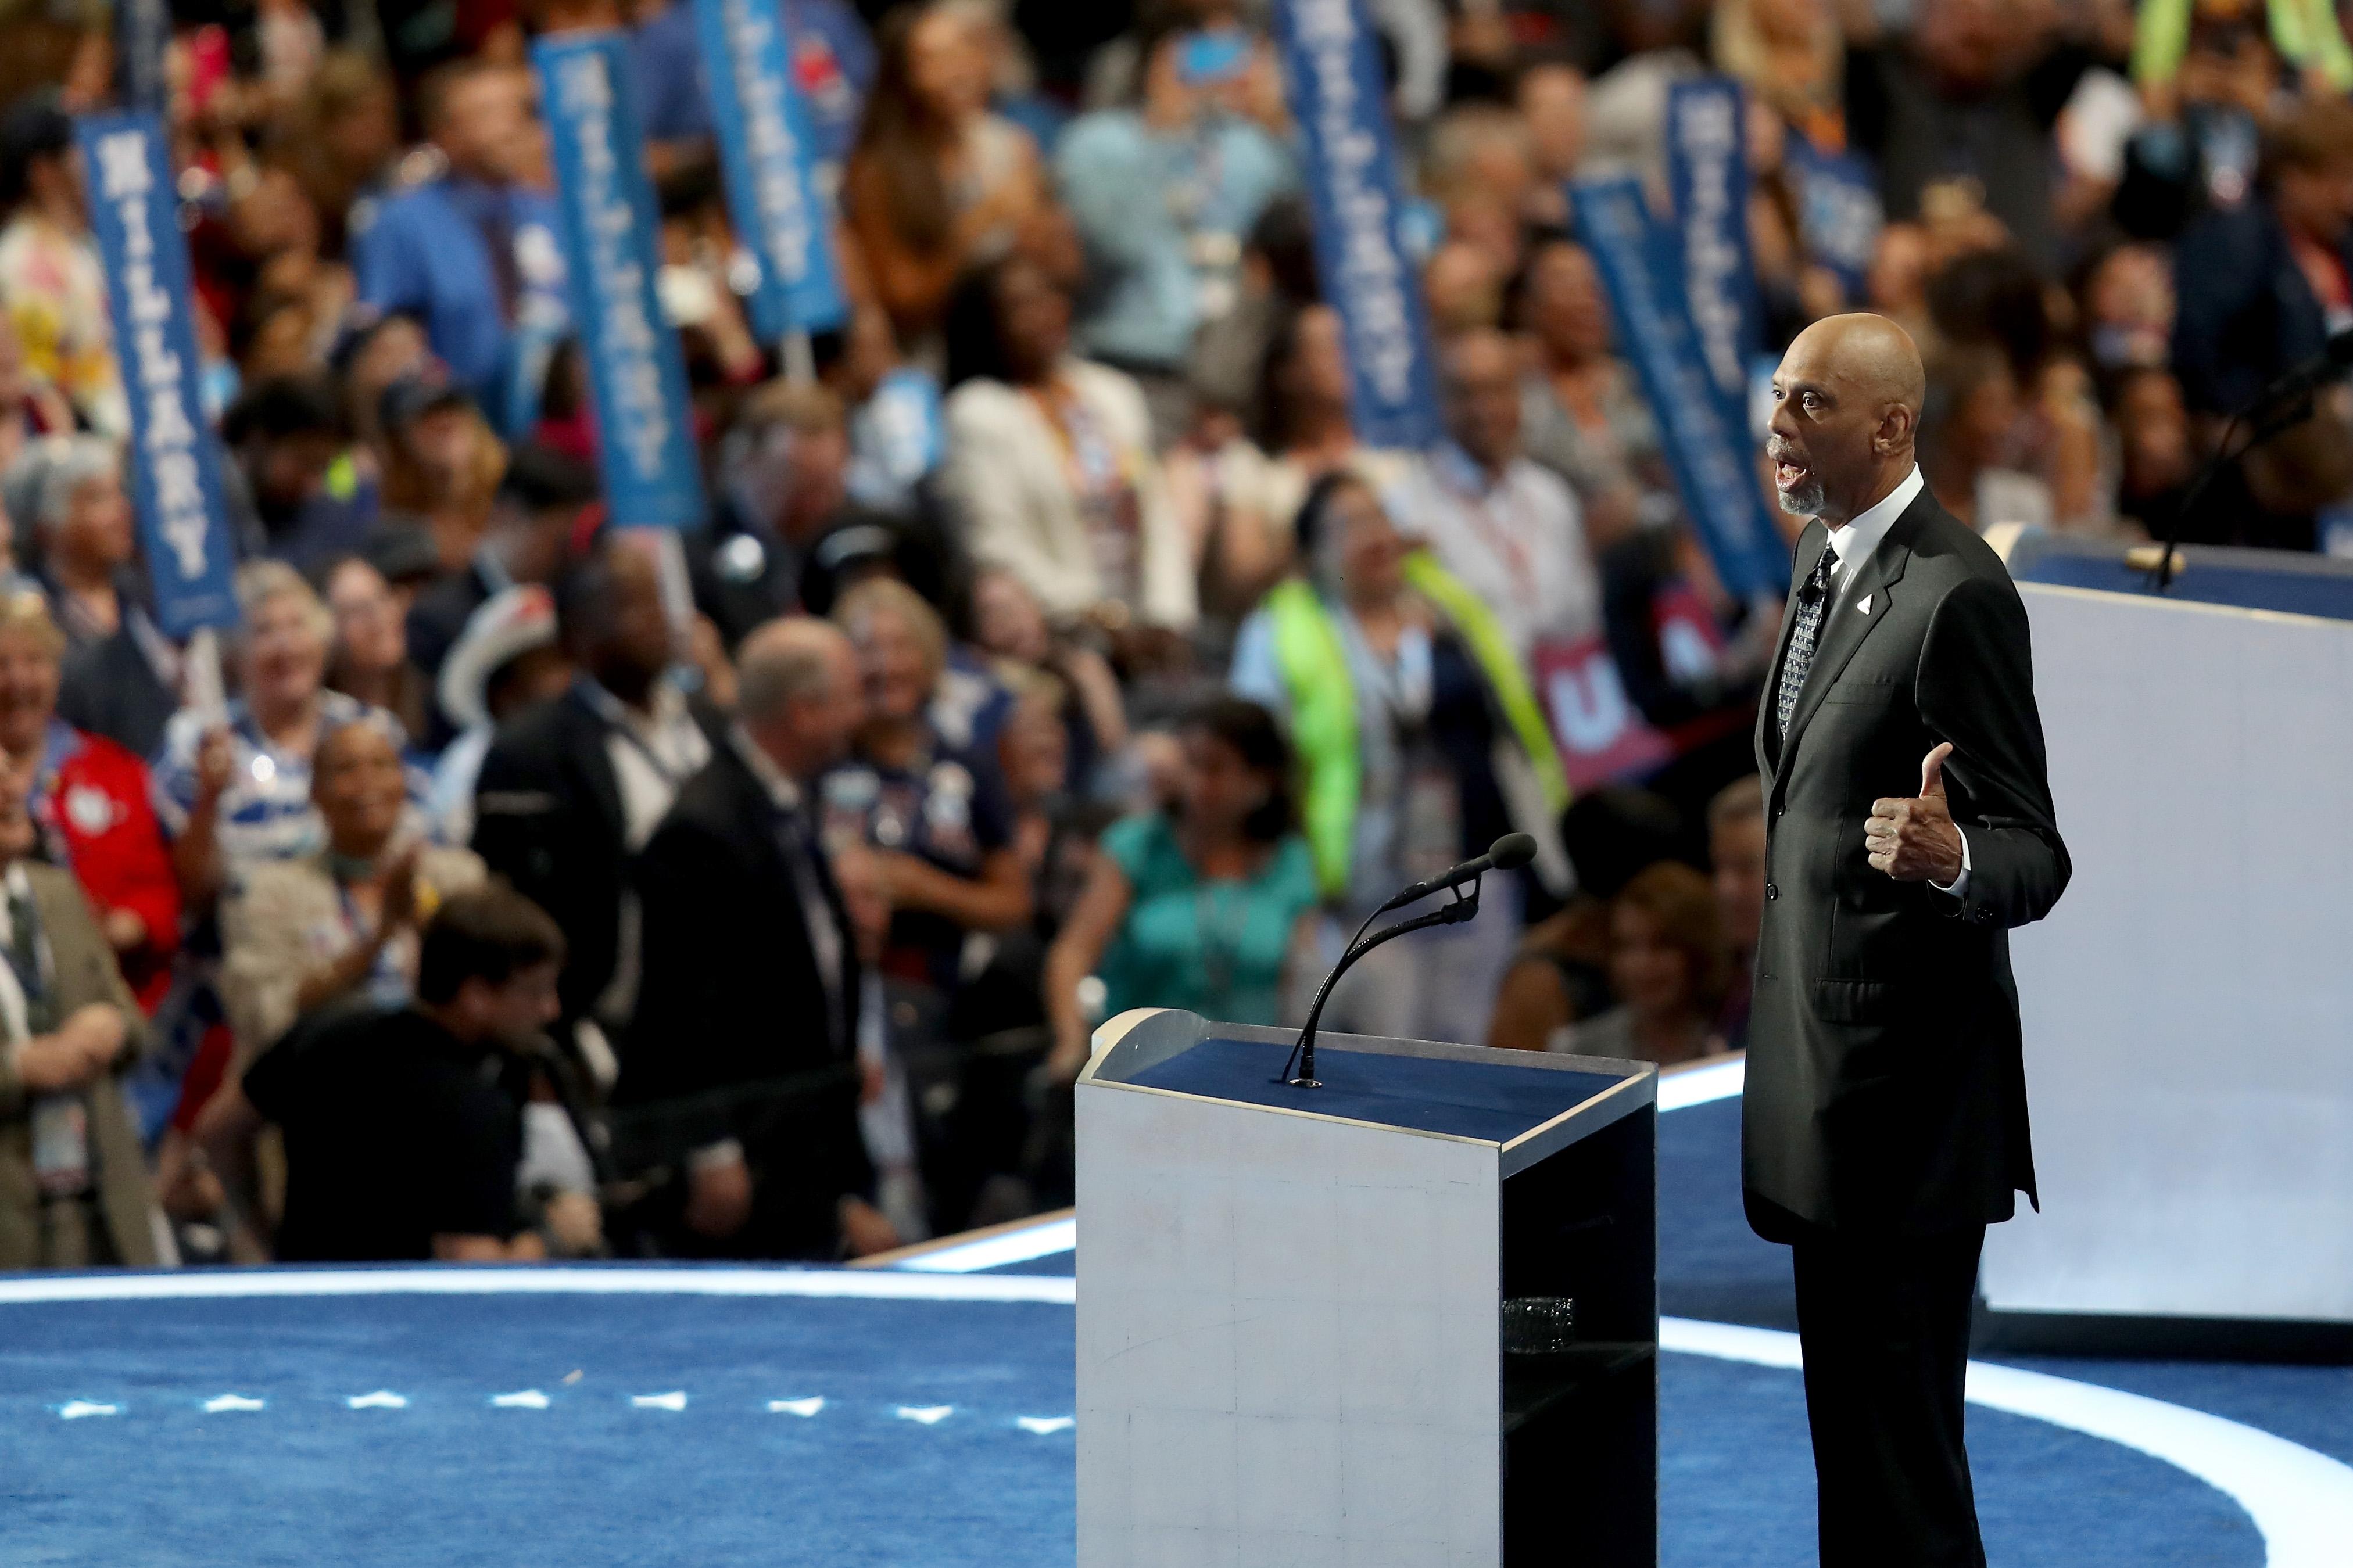 Kareem Abdul-Jabbar at the Democratic convention.